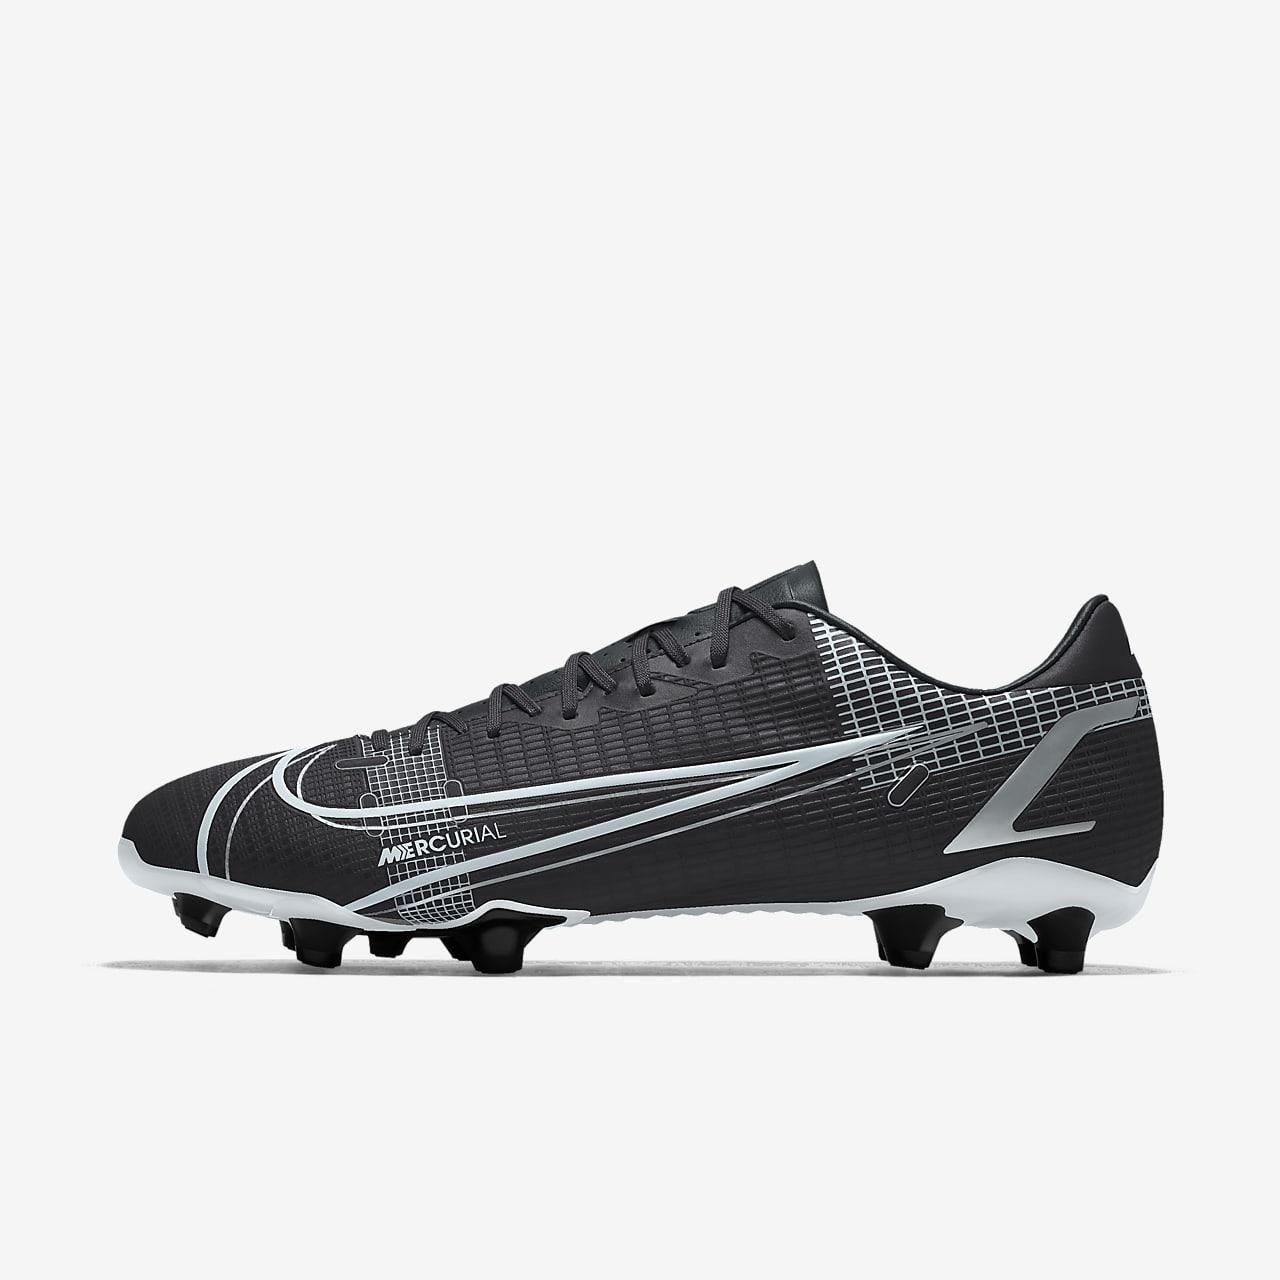 Nike Mercurial Vapor 14 Academy By You 專屬訂製足球釘鞋